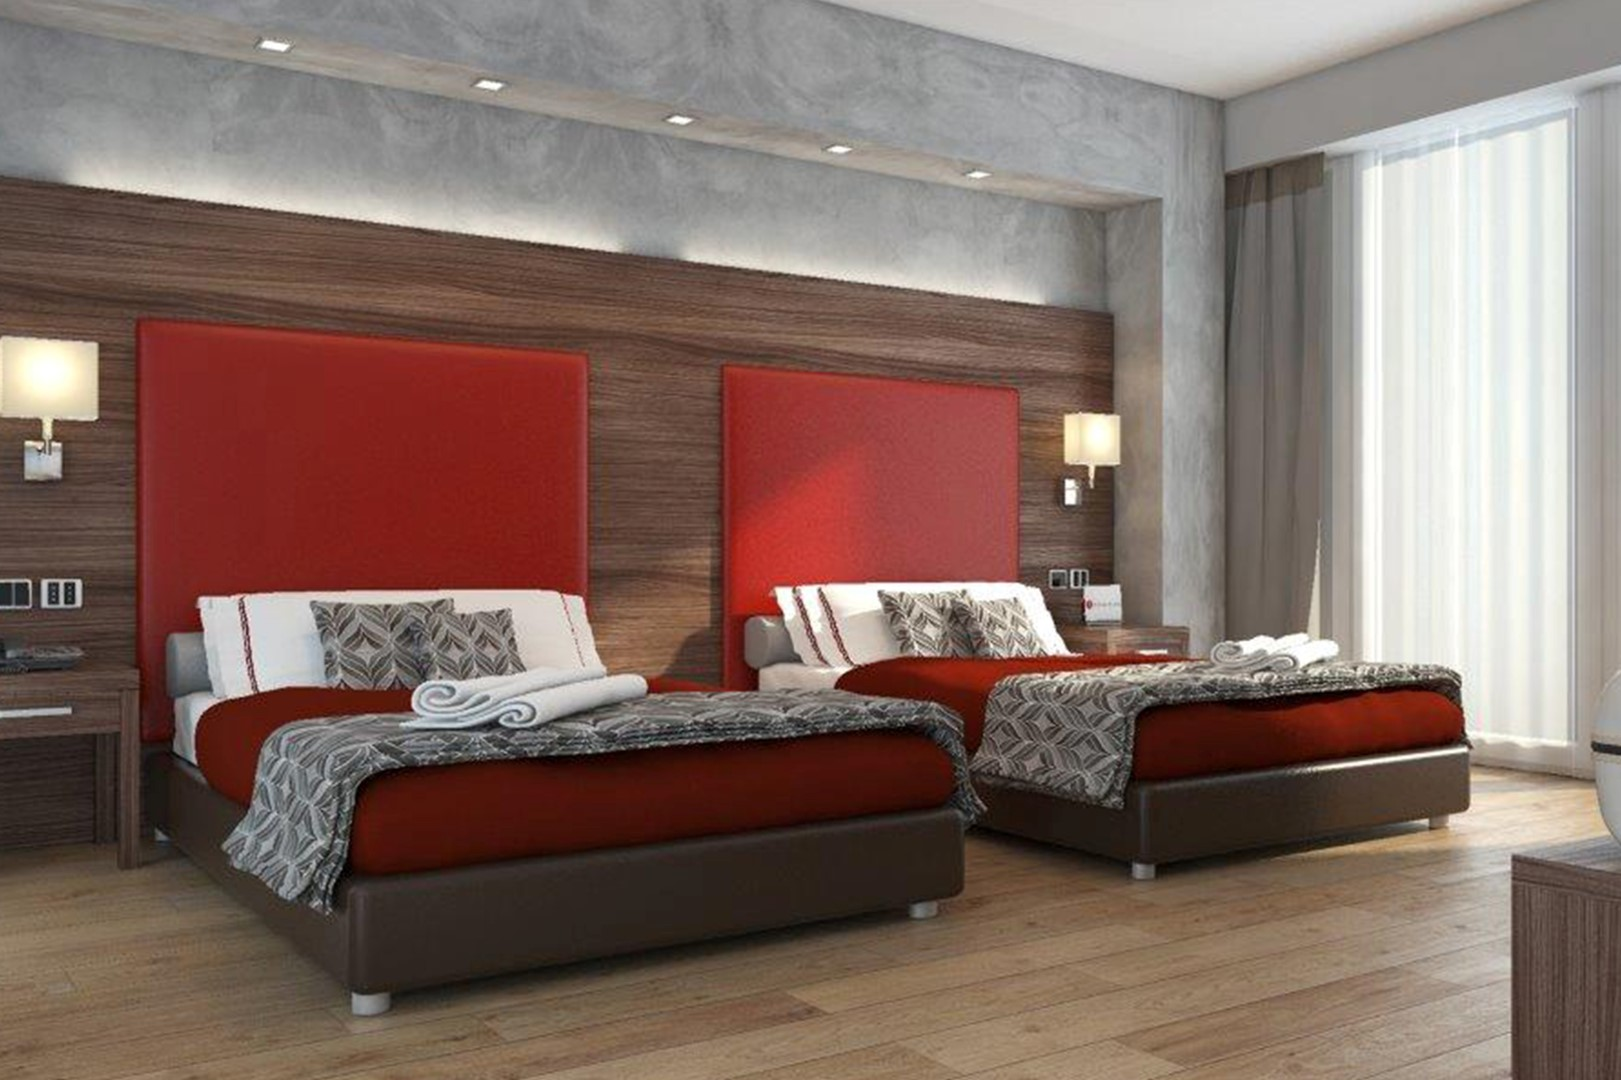 furniture_0006_2.twin room_hotel furniture (3)